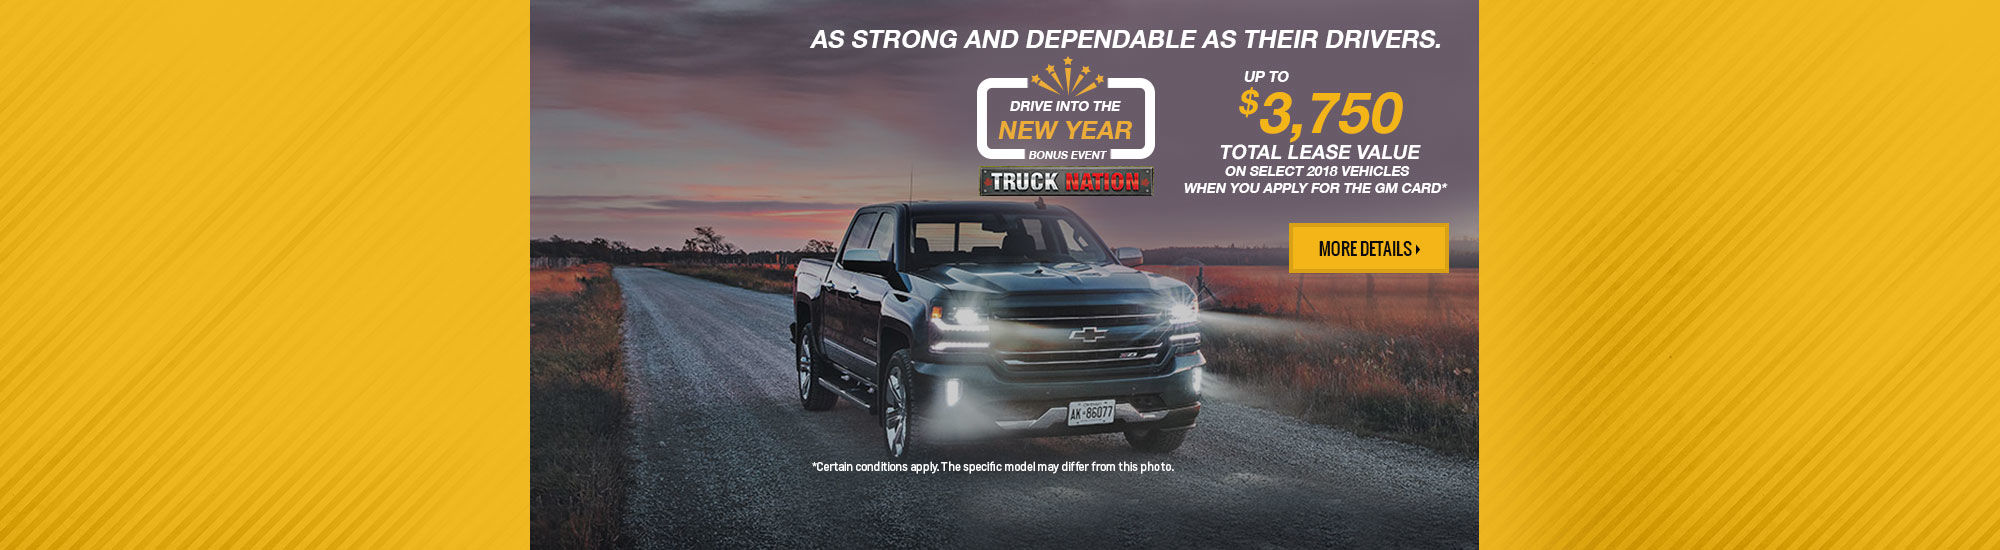 Drive Into the New Year Bonus Even - Chevrolet